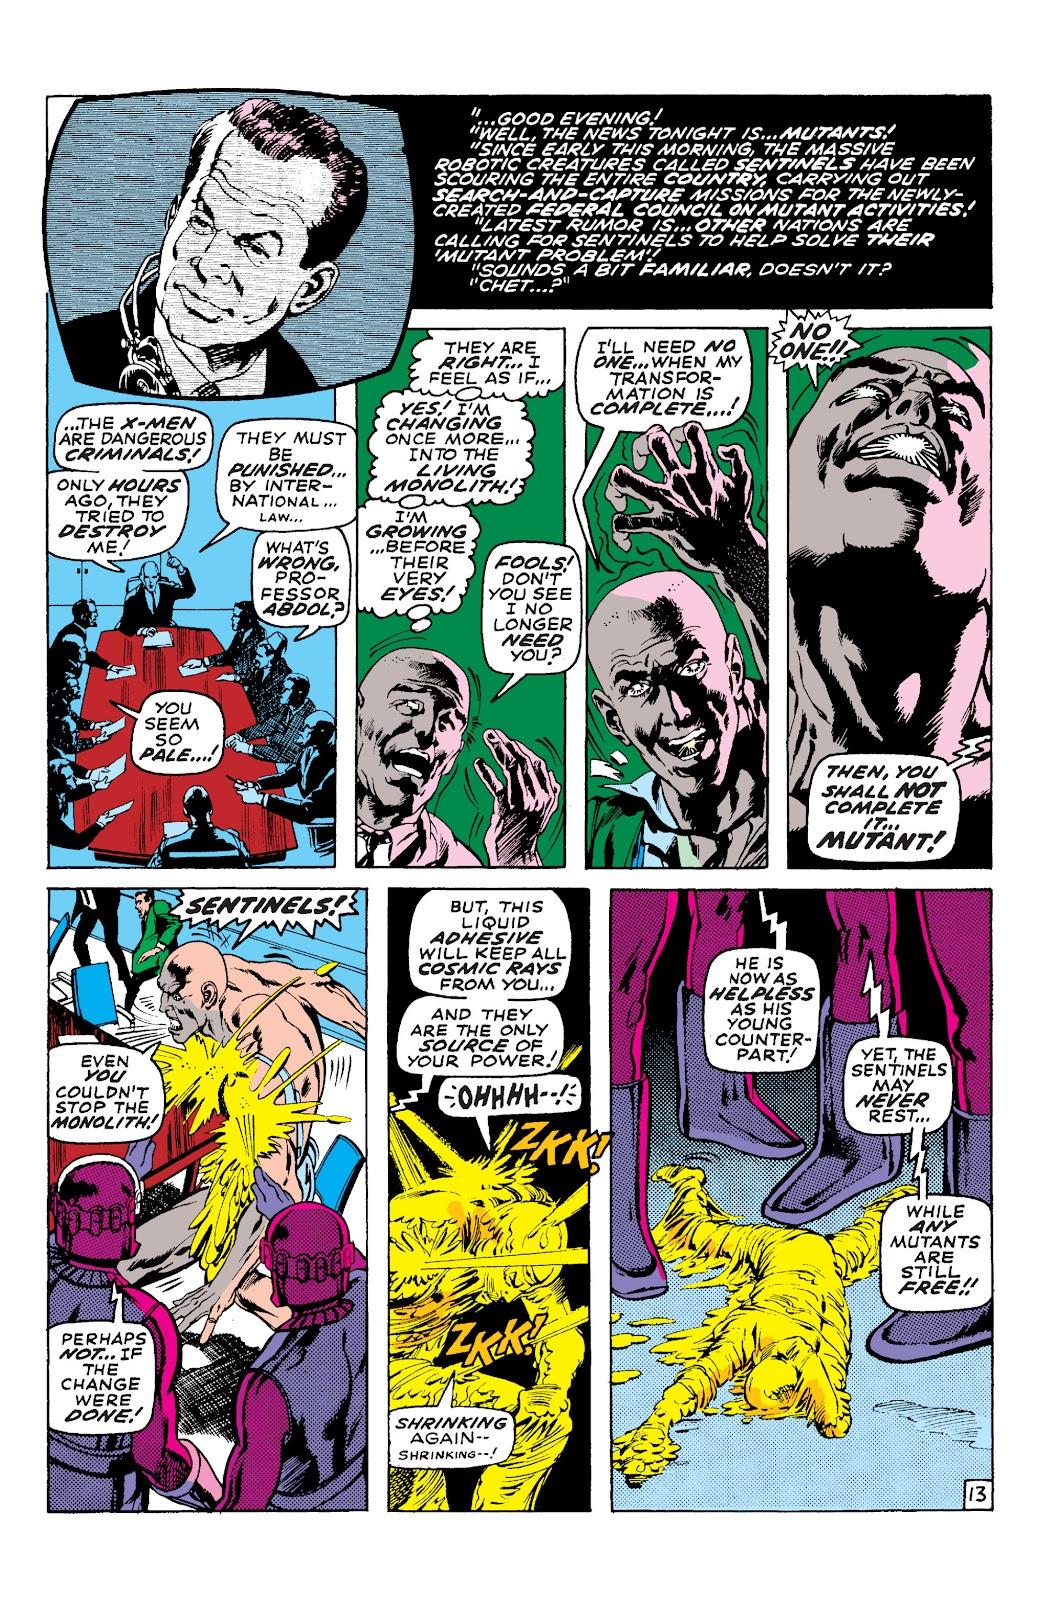 Uncanny X Men 1963 Issue 58 | Viewcomic reading comics